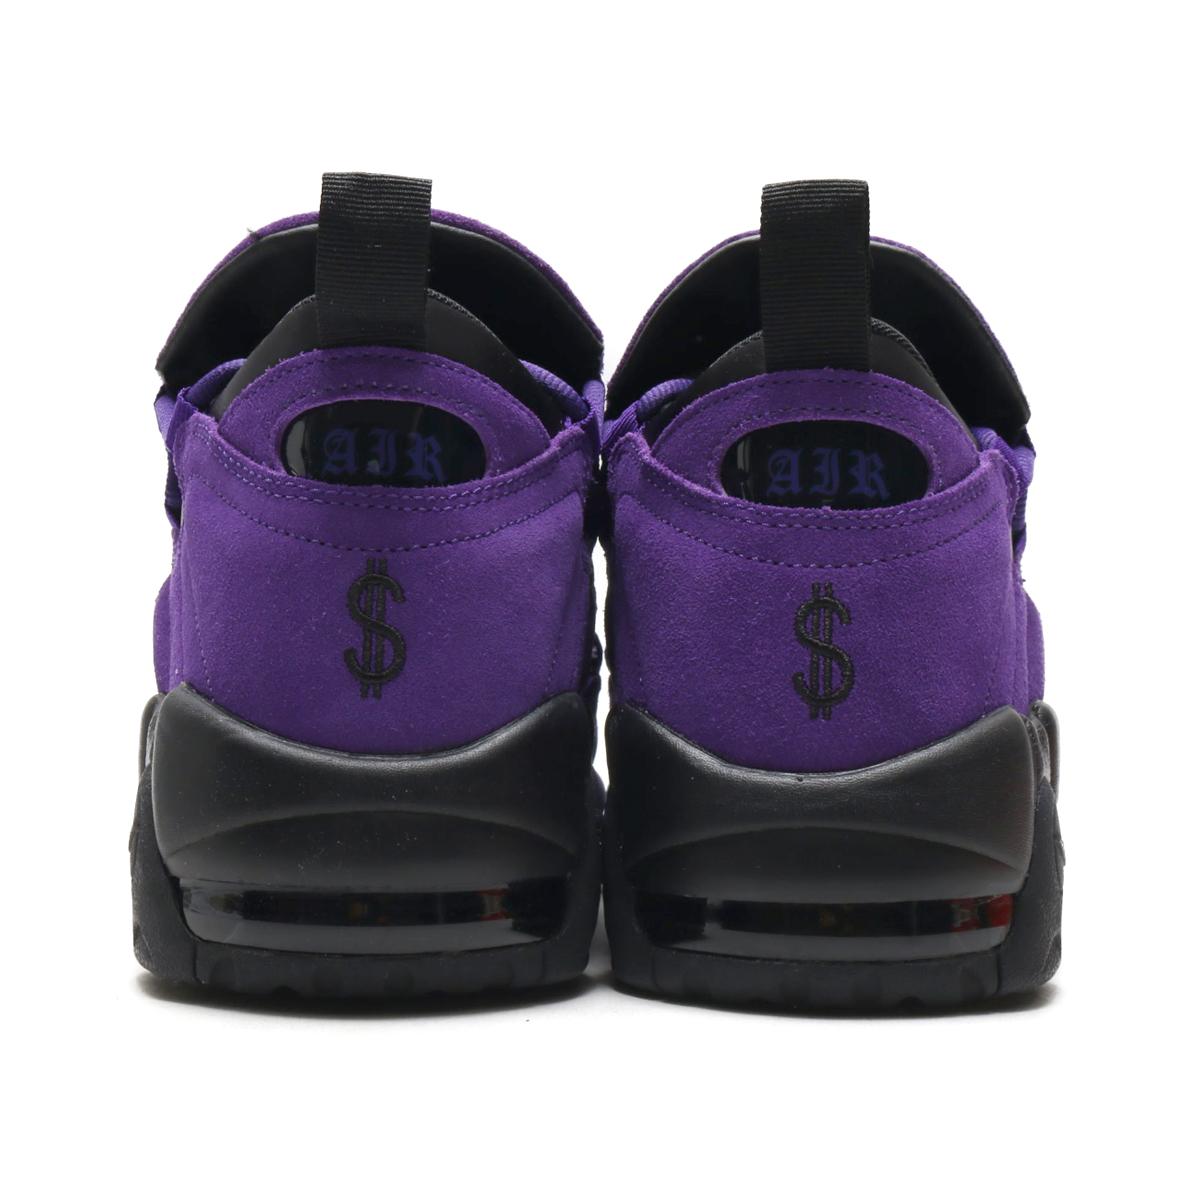 hot sale online 5fa43 5ab45 NIKE AIR MORE MONEY QS PRPL (Nike air more money QS PRPL) (COURT PURPLECOURT  PURPLE-BLACK) 18SU-S